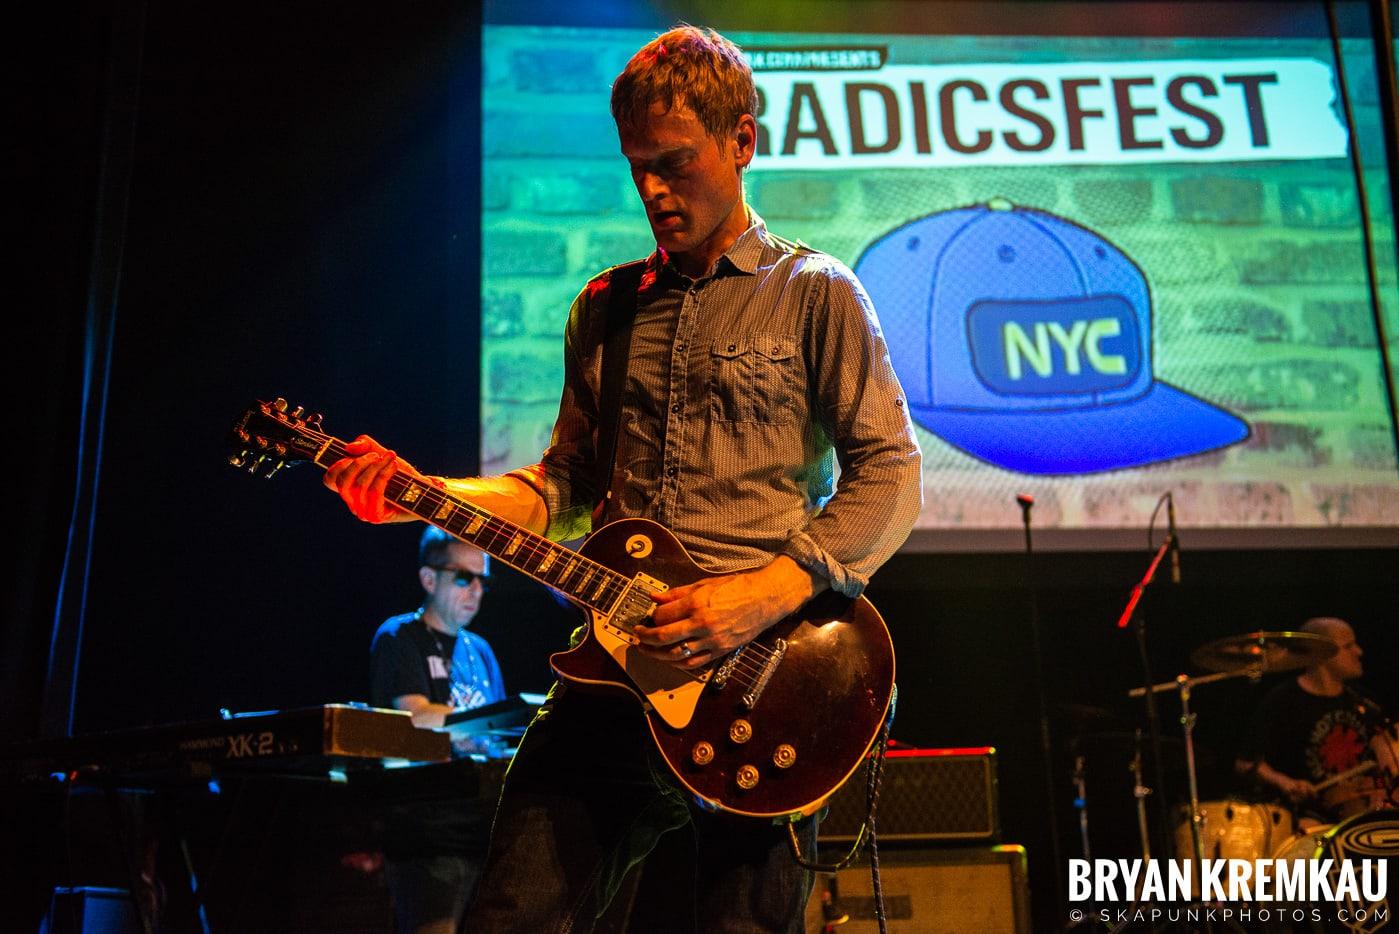 Pilfers @ Radicsfest, Gramercy Theatre, NYC - 7.19.19 (1)